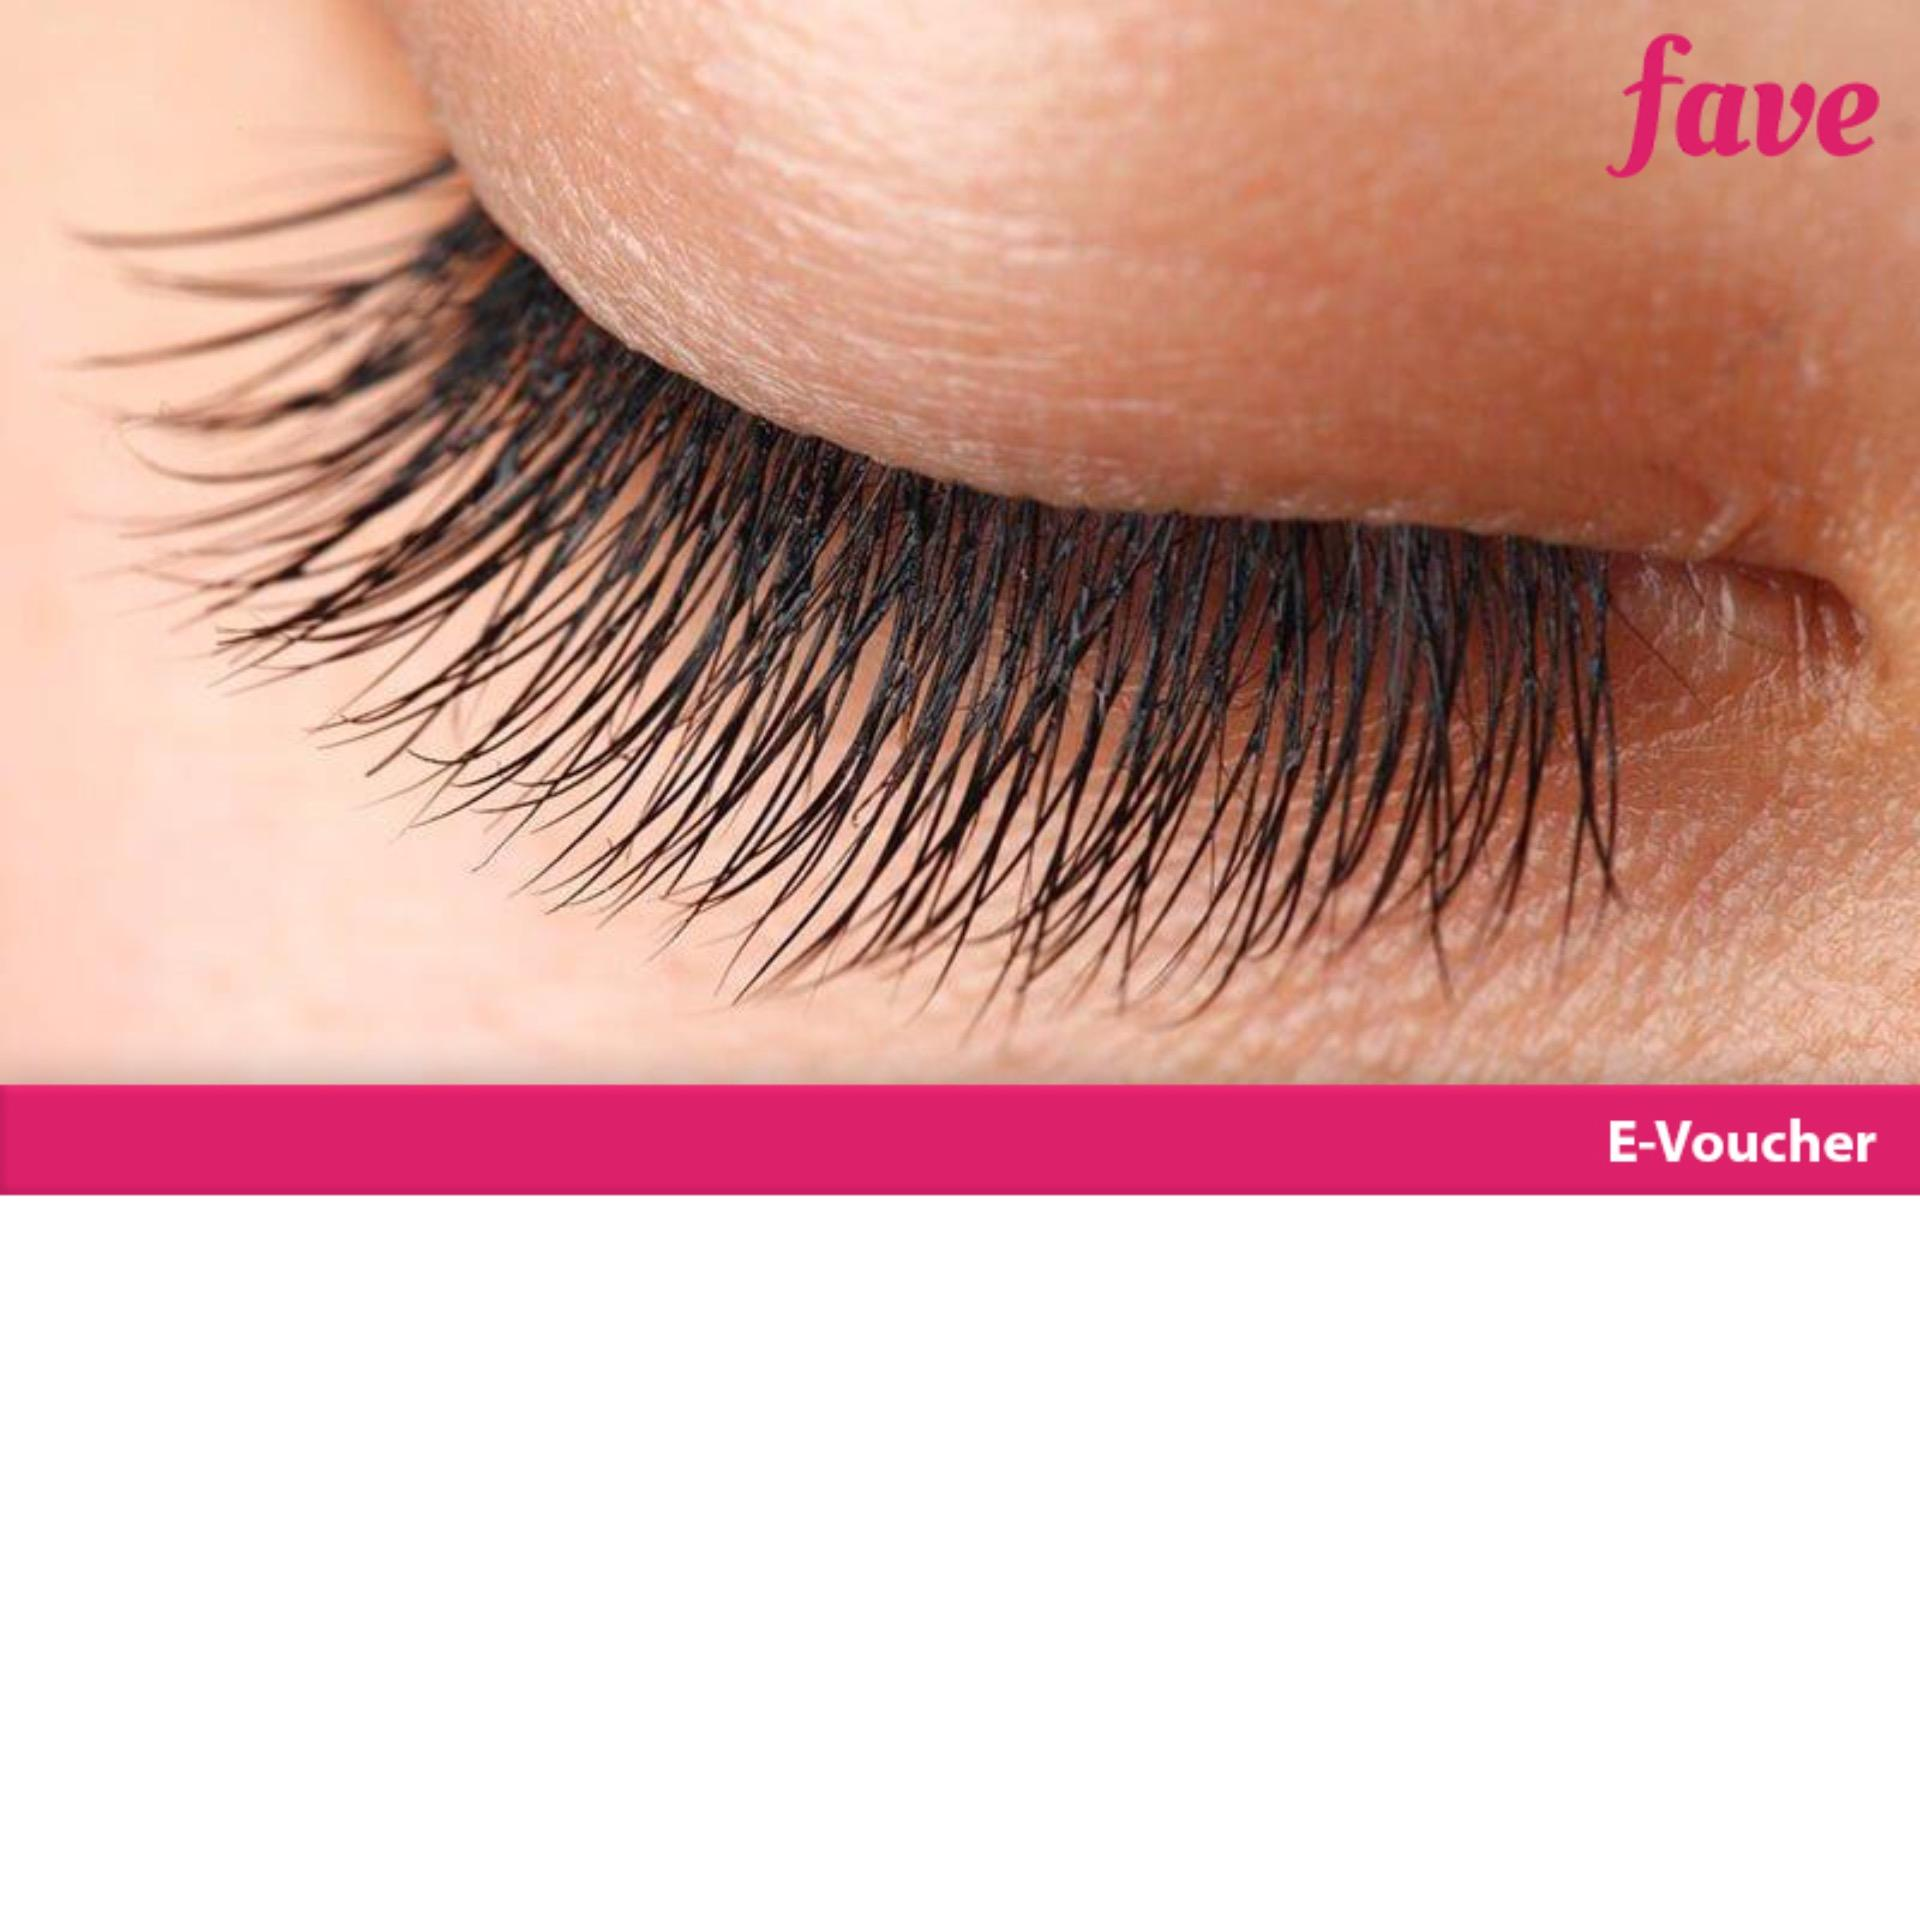 [mall Ambassador] Aurel Hair & Beauty 1x Eyelash Extention Korean + Free Sikat Eyelash + 1x Retouch By Fave Indonesia.